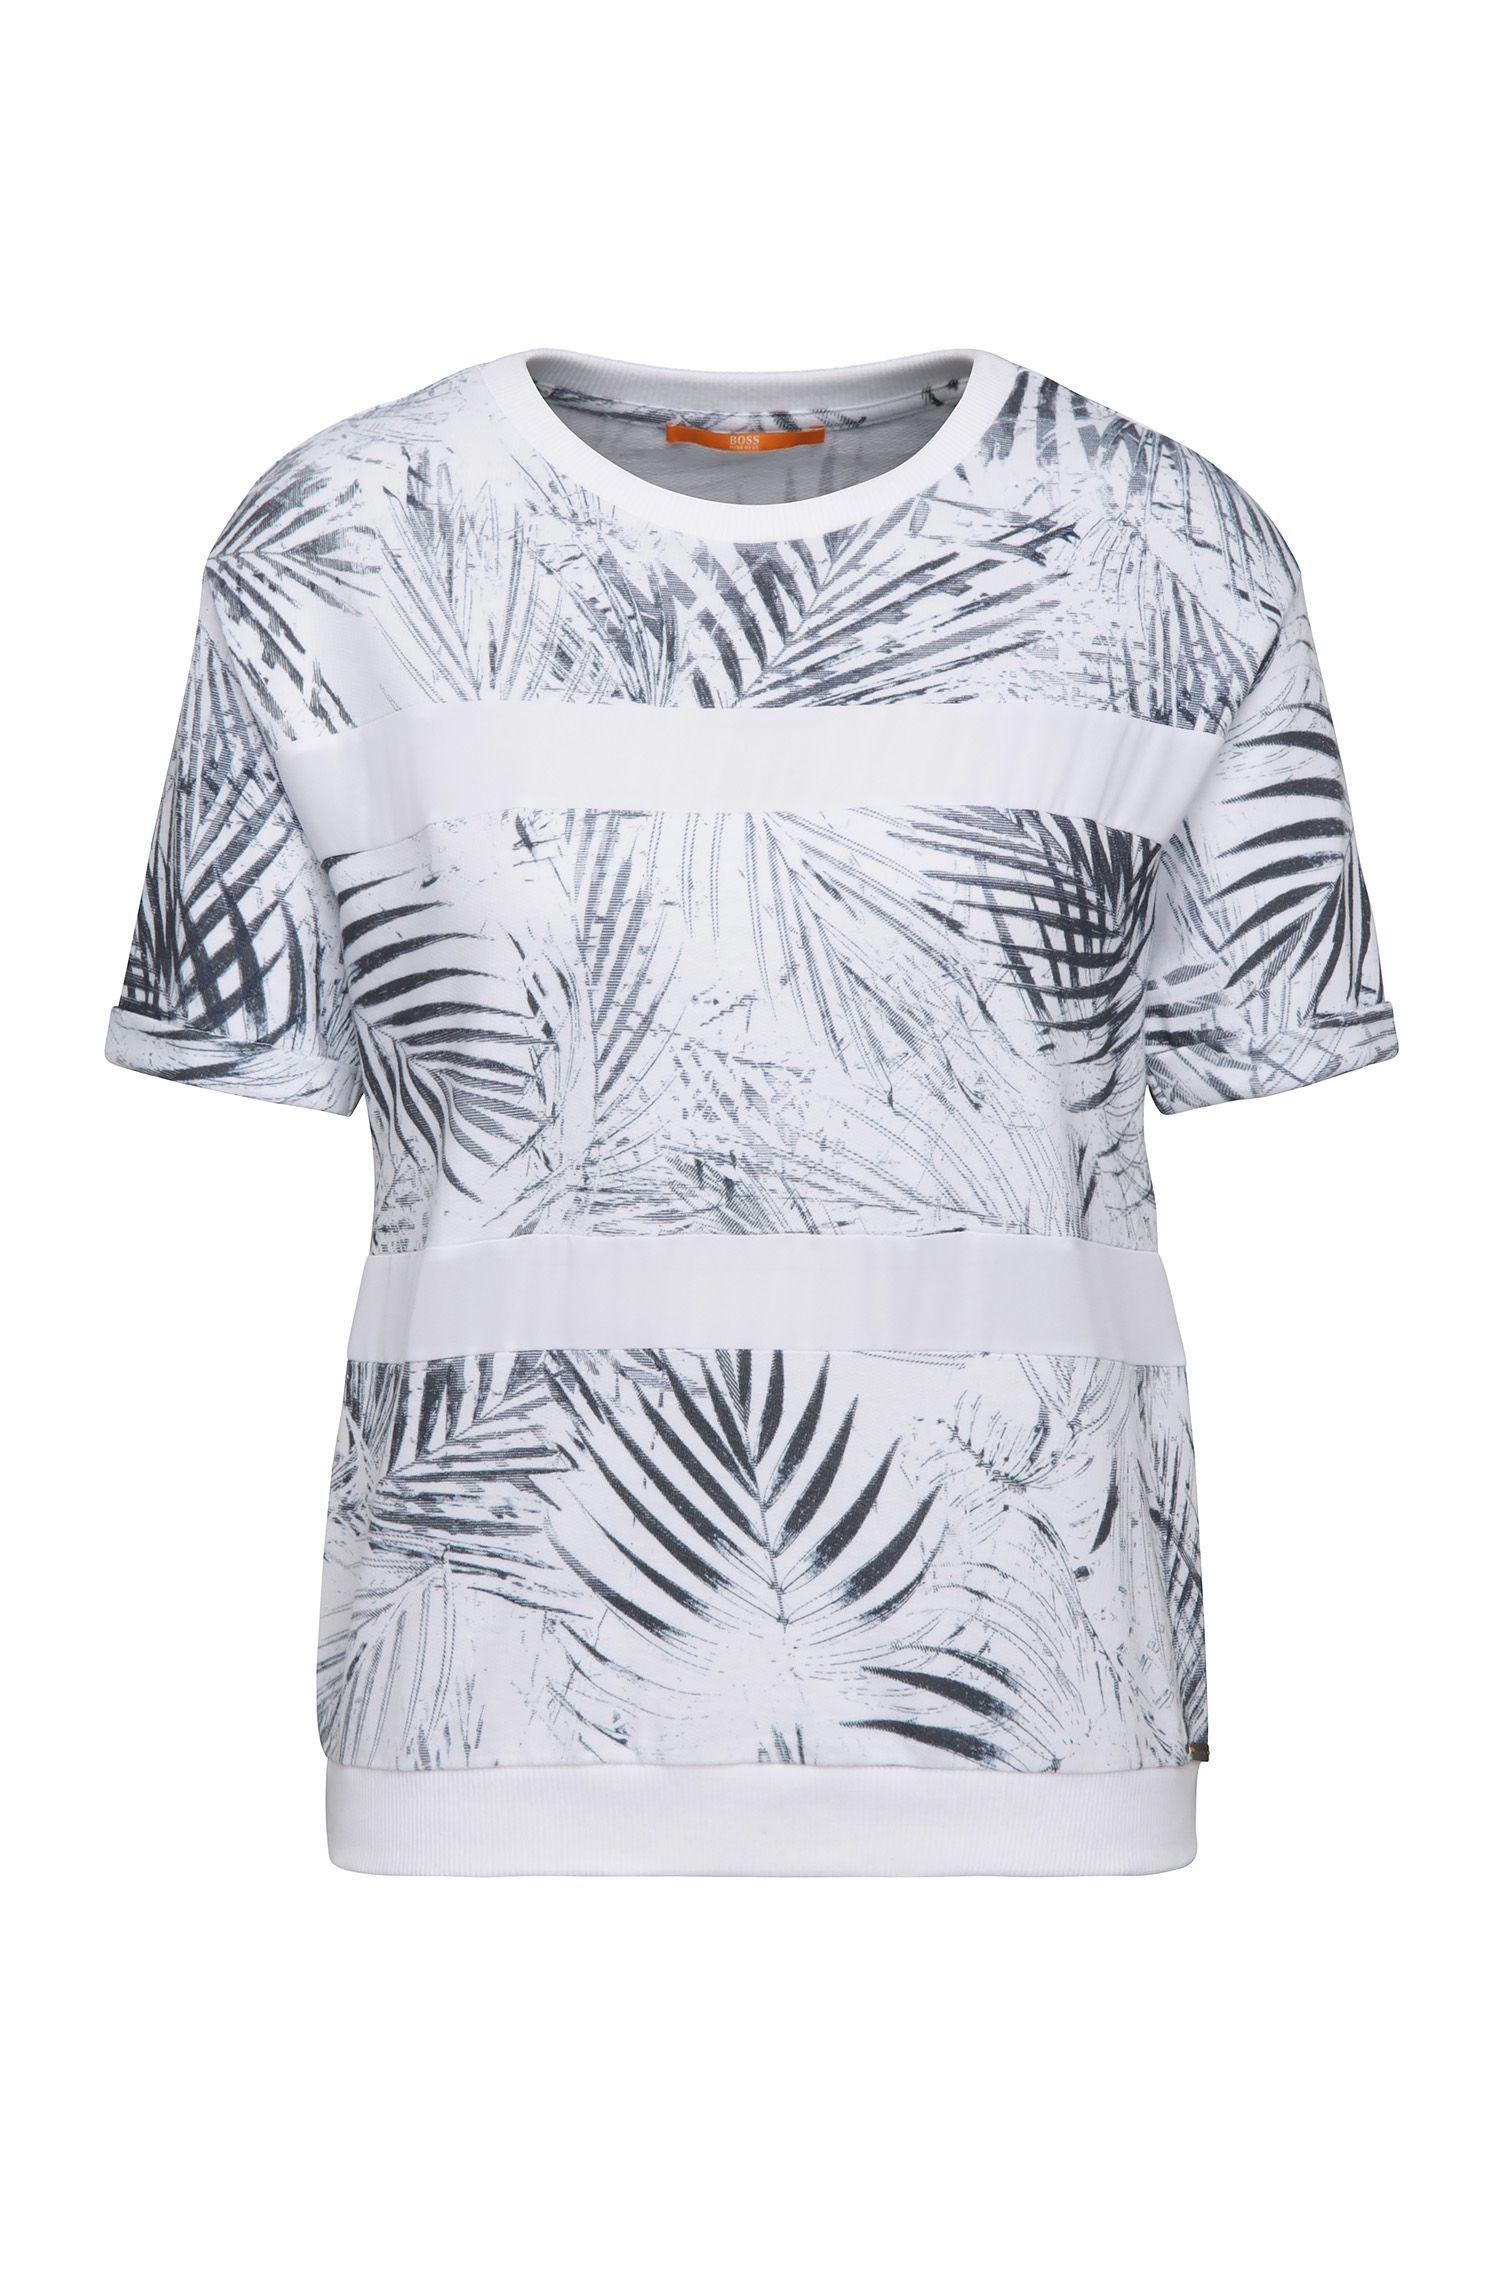 Relaxed-Fit Sweat-Shirt aus Baumwoll-Mix mit Palmwedel-Muster: ´Tabloom`